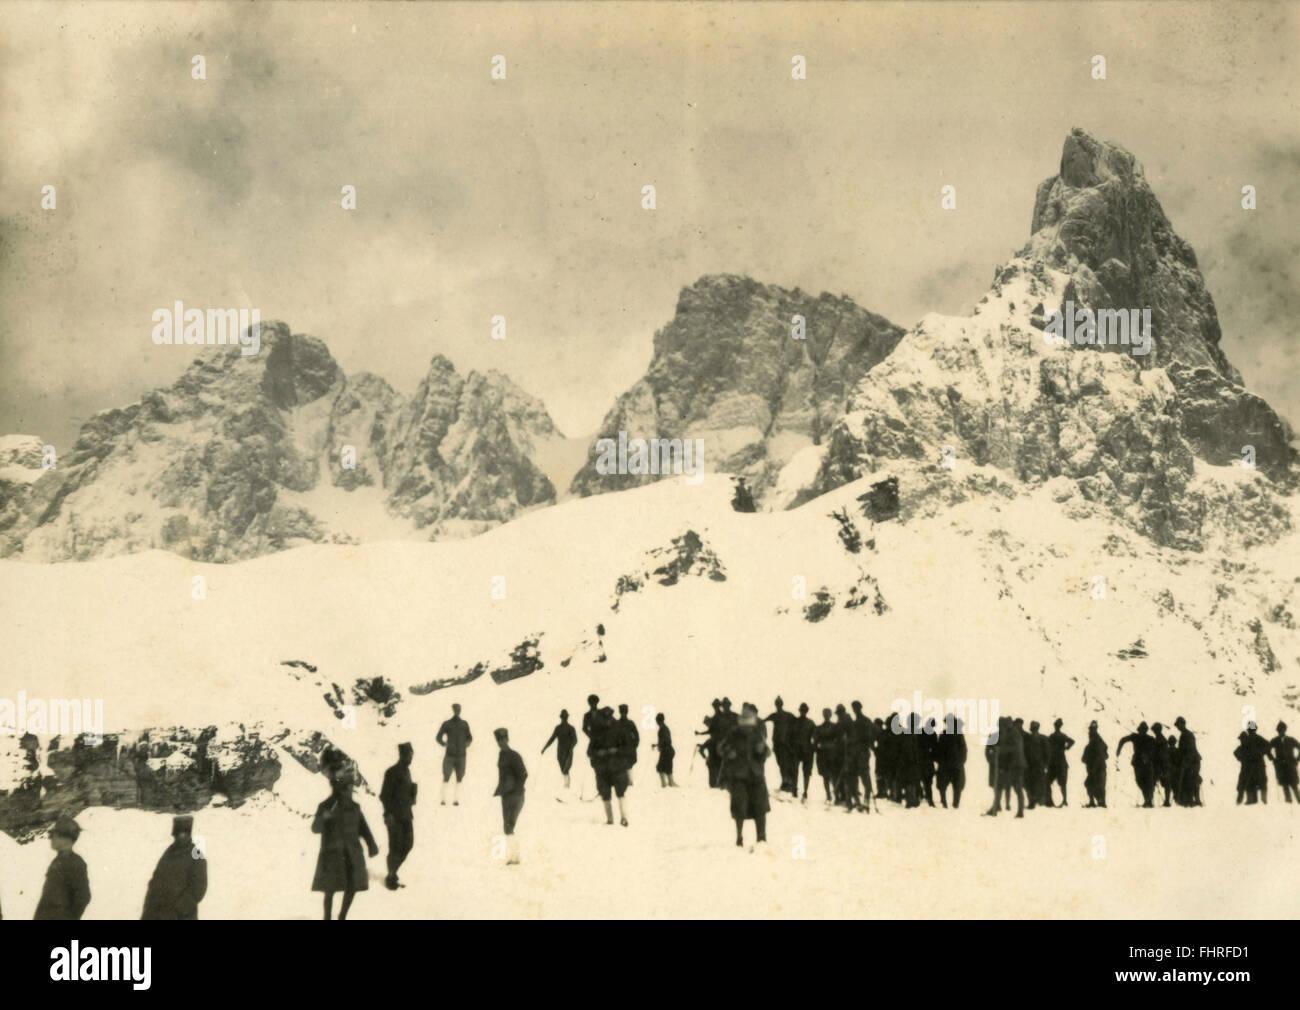 Battalion of Alpini, Italy - Stock Image